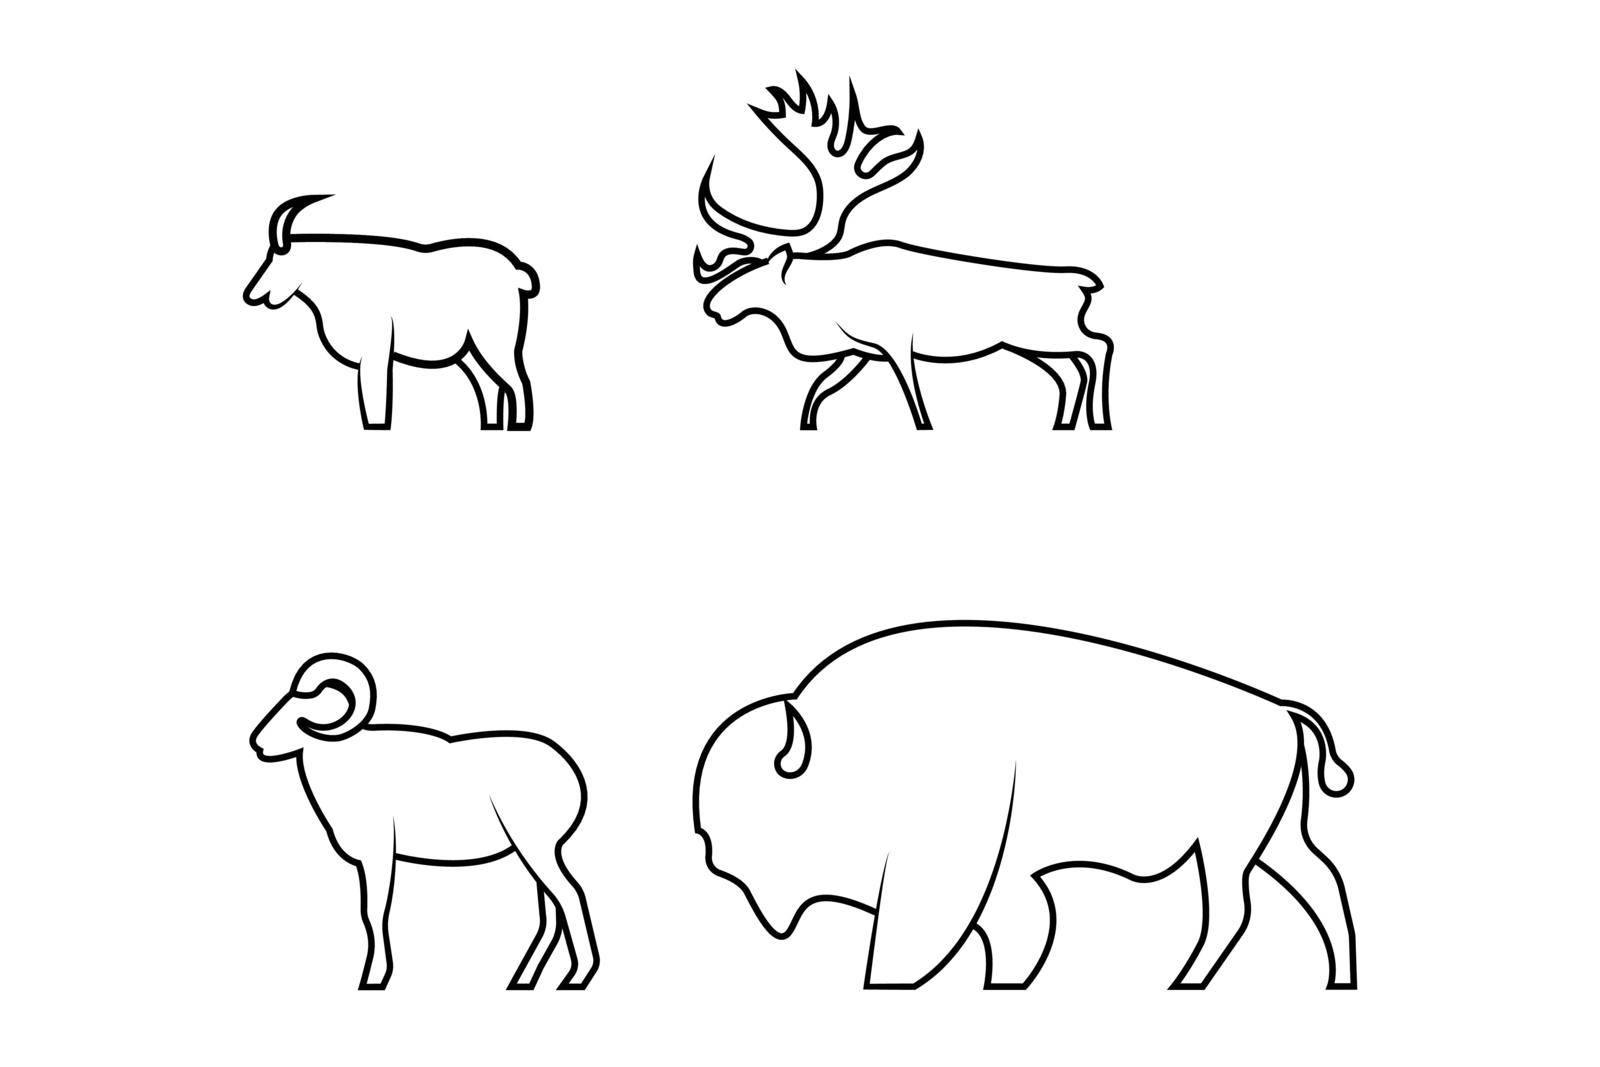 Horned wildlife animals vector illustration on a white background